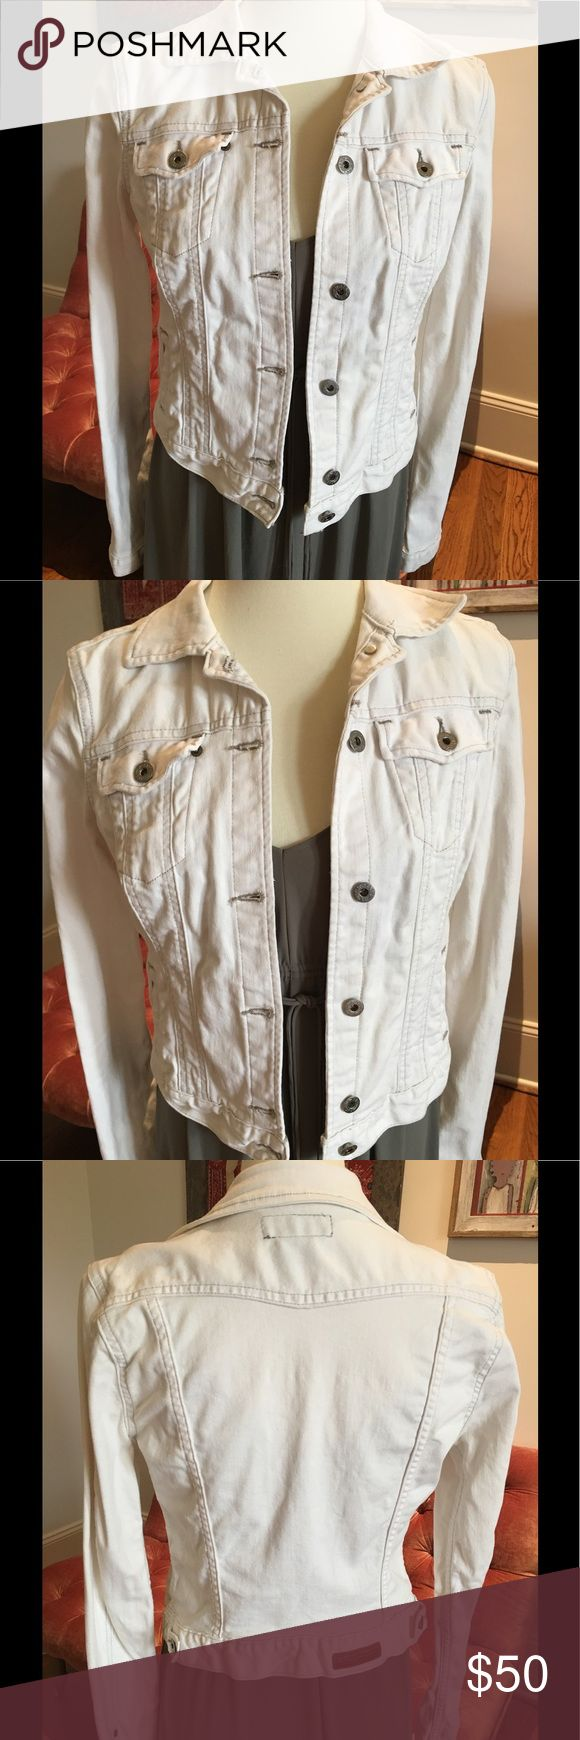 Polo Jean Jacket Polo Jean Jacket, great fit, comfortable cotton, side pockets Polo by Ralph Lauren Jackets & Coats Jean Jackets